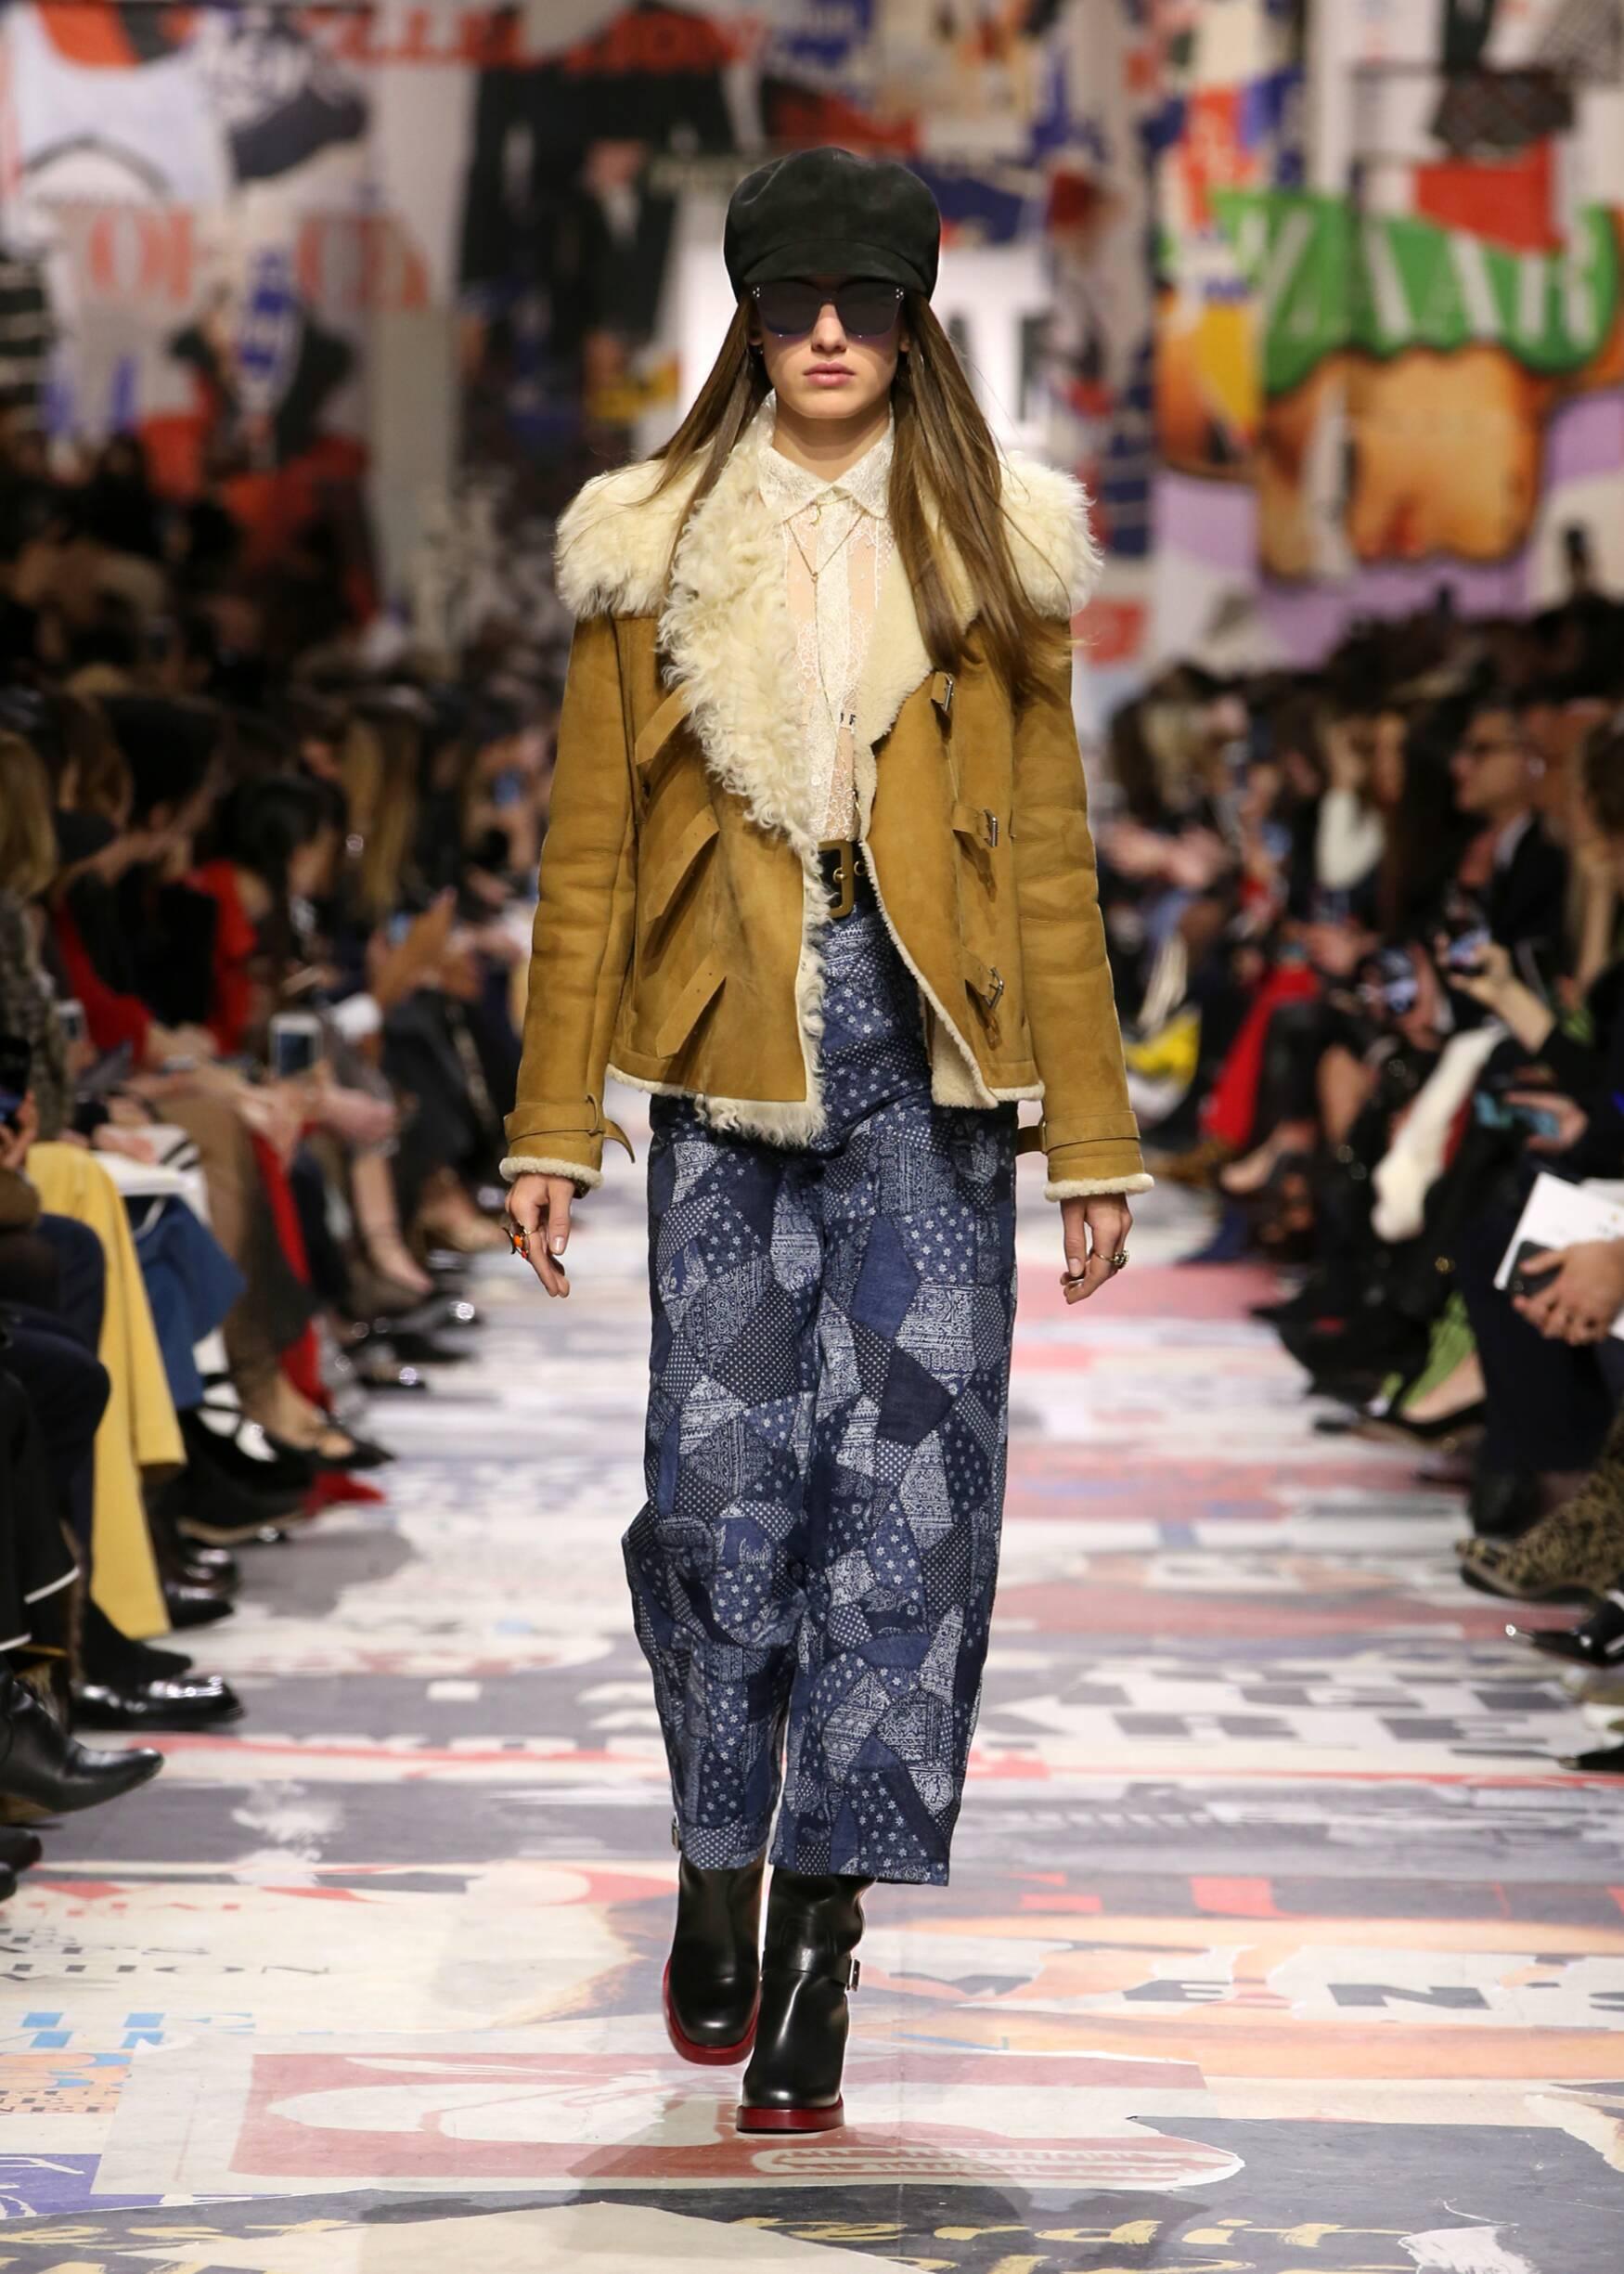 2018 Catwalk Dior Woman Fashion Show Winter